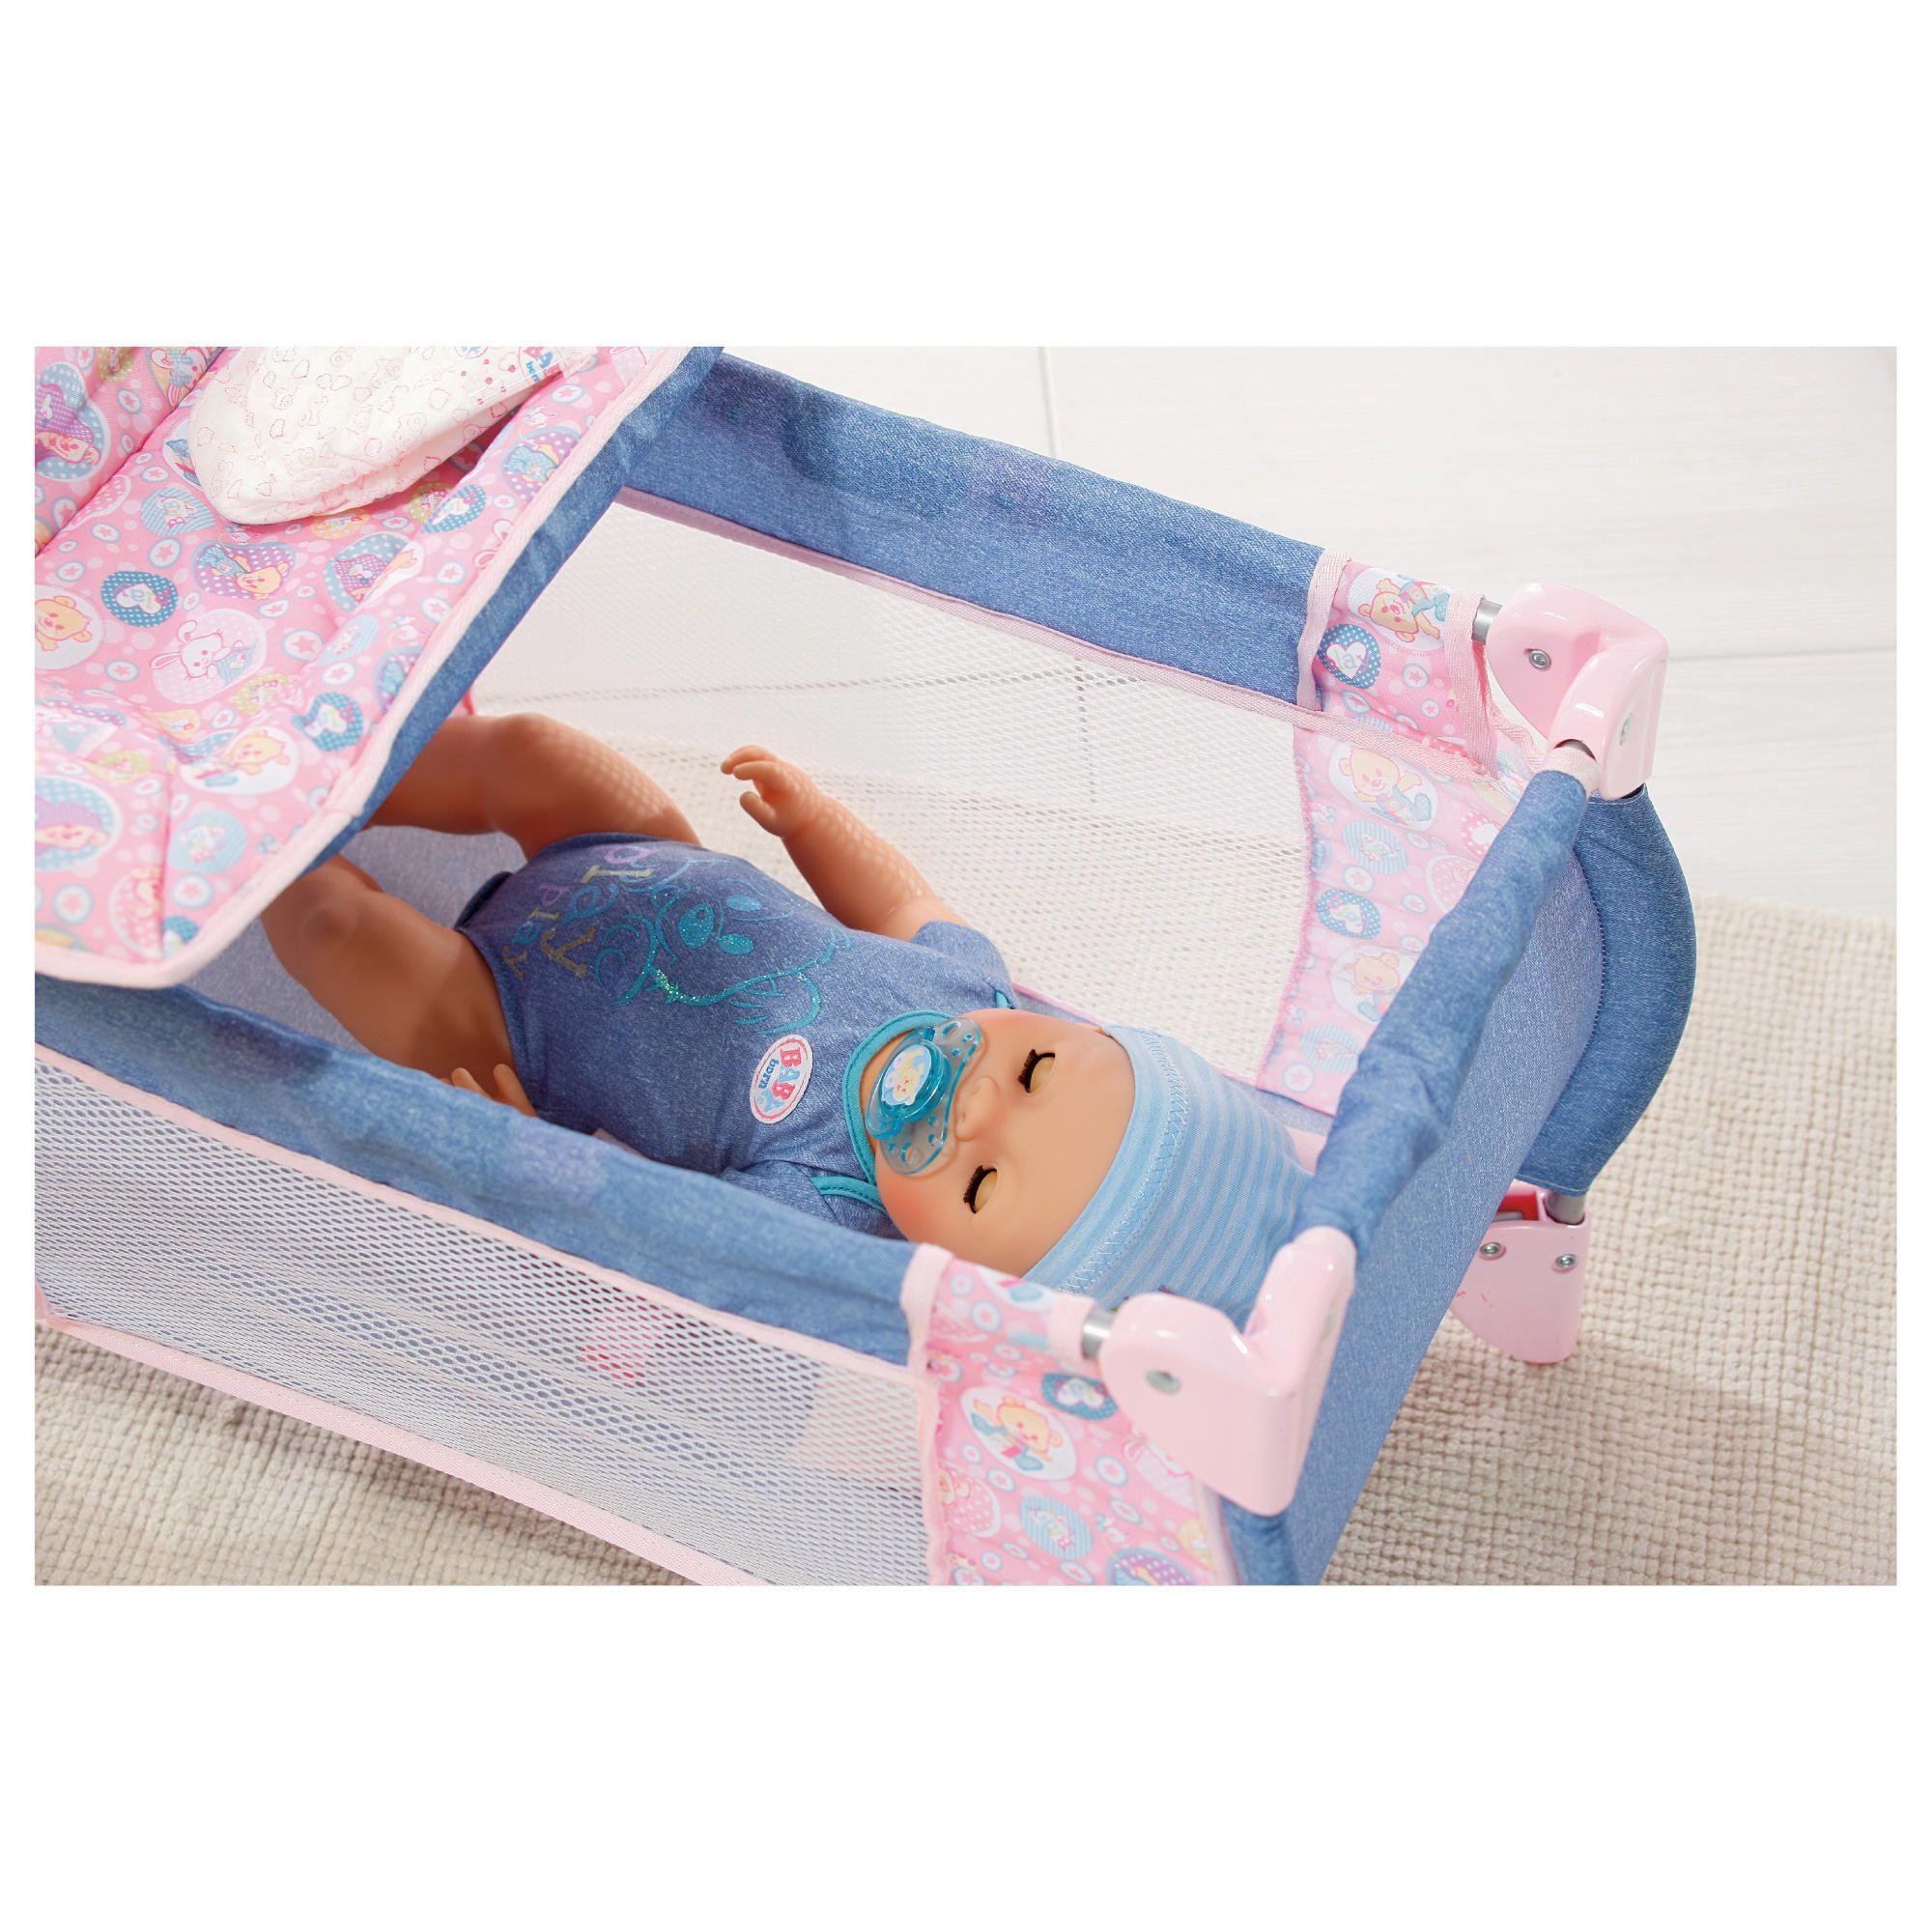 Дом для куклы беби бон своими руками